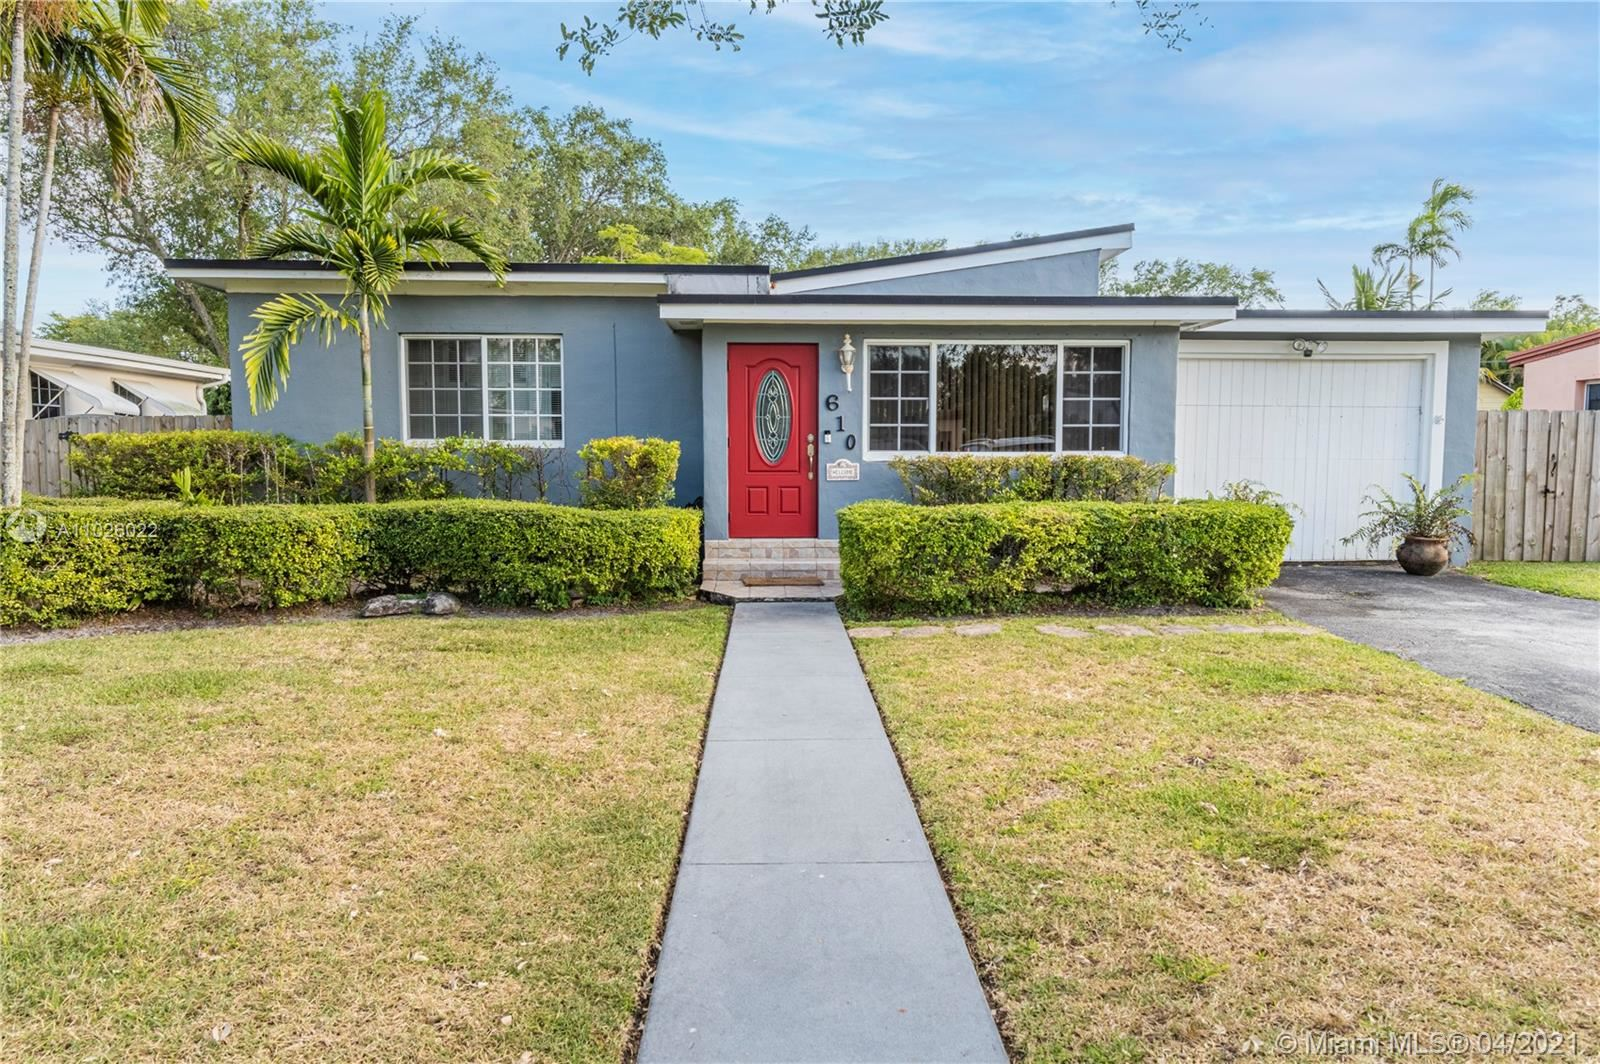 610 Raven Ave, Miami Springs, FL 33166 - #: A11026022